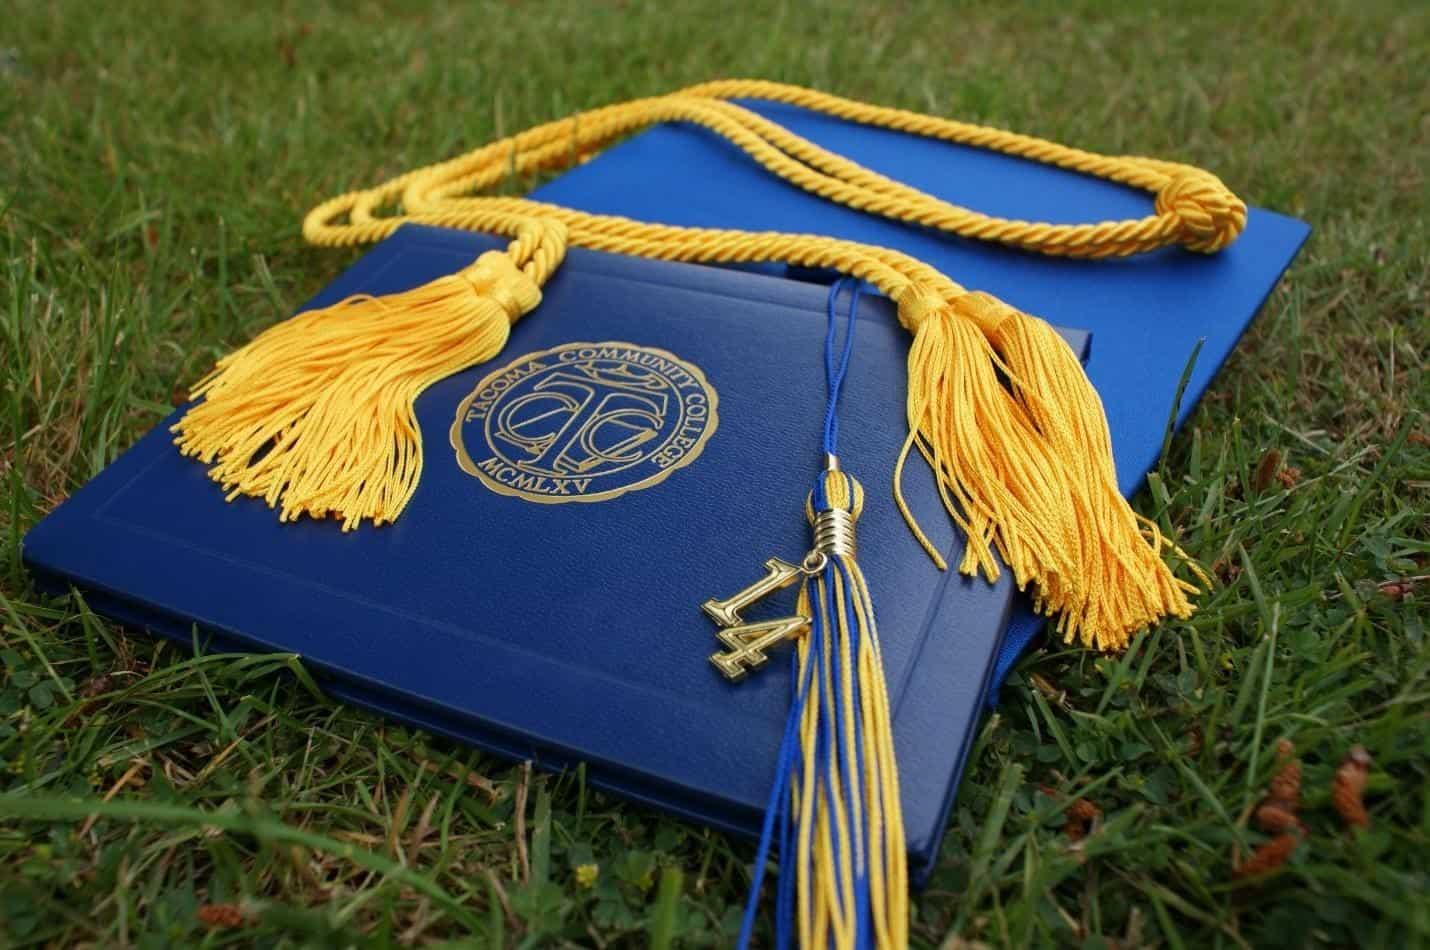 business schools that don't require gmat - Graduation